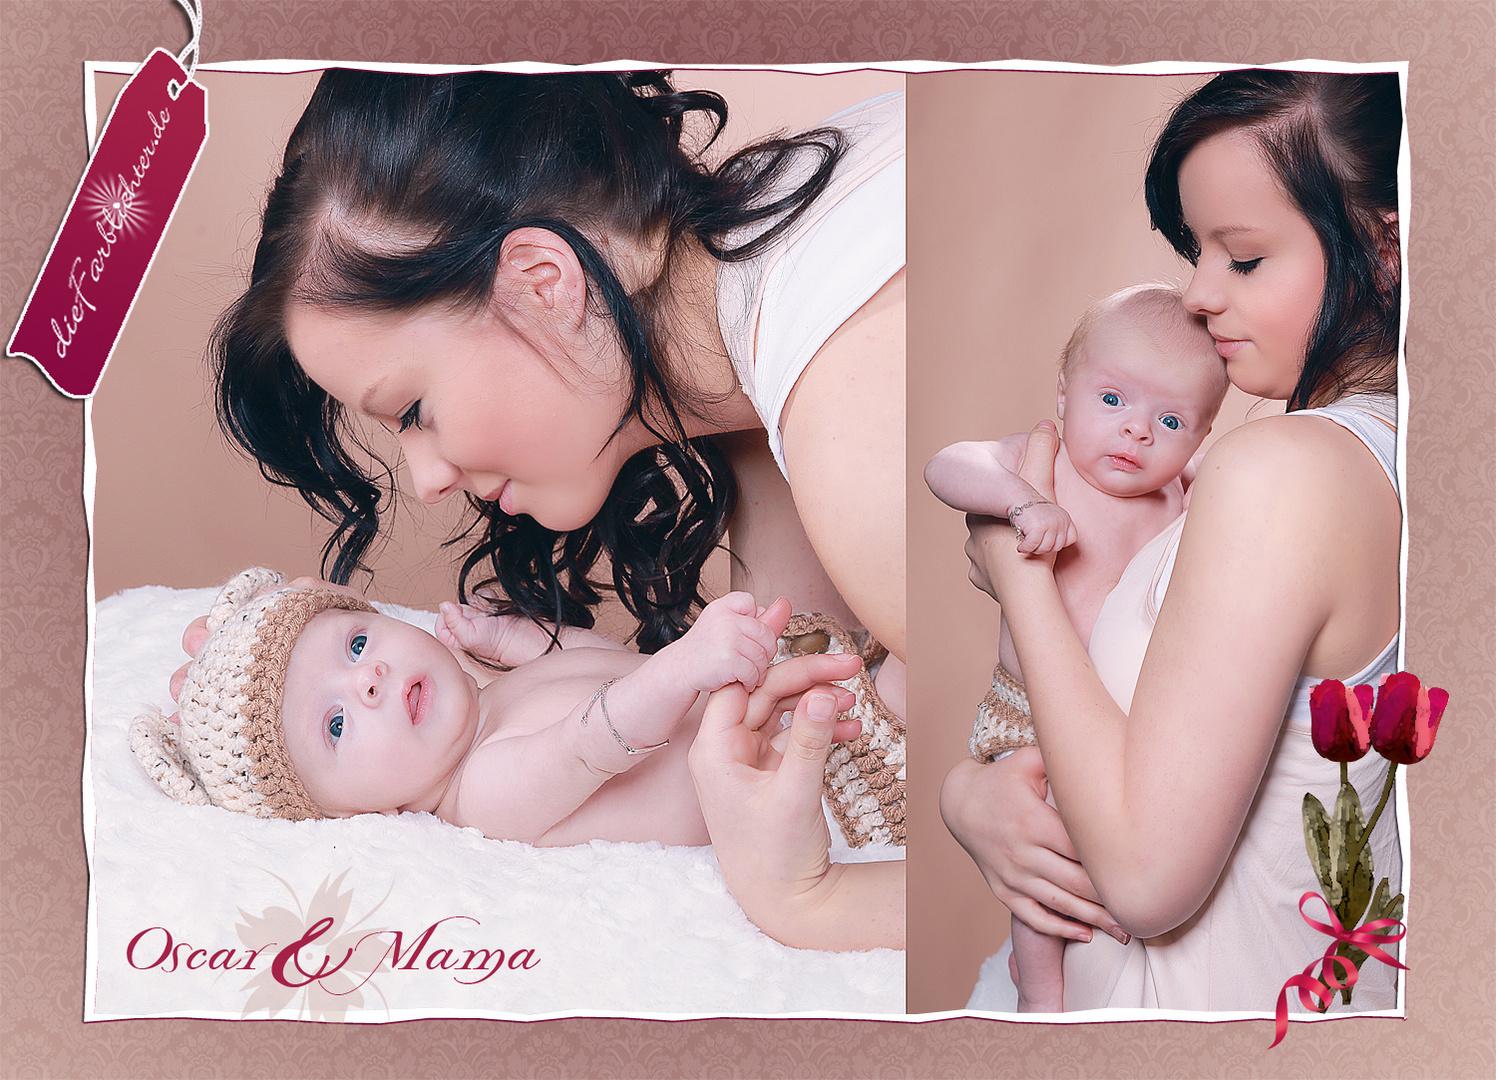 Oscar & Mama